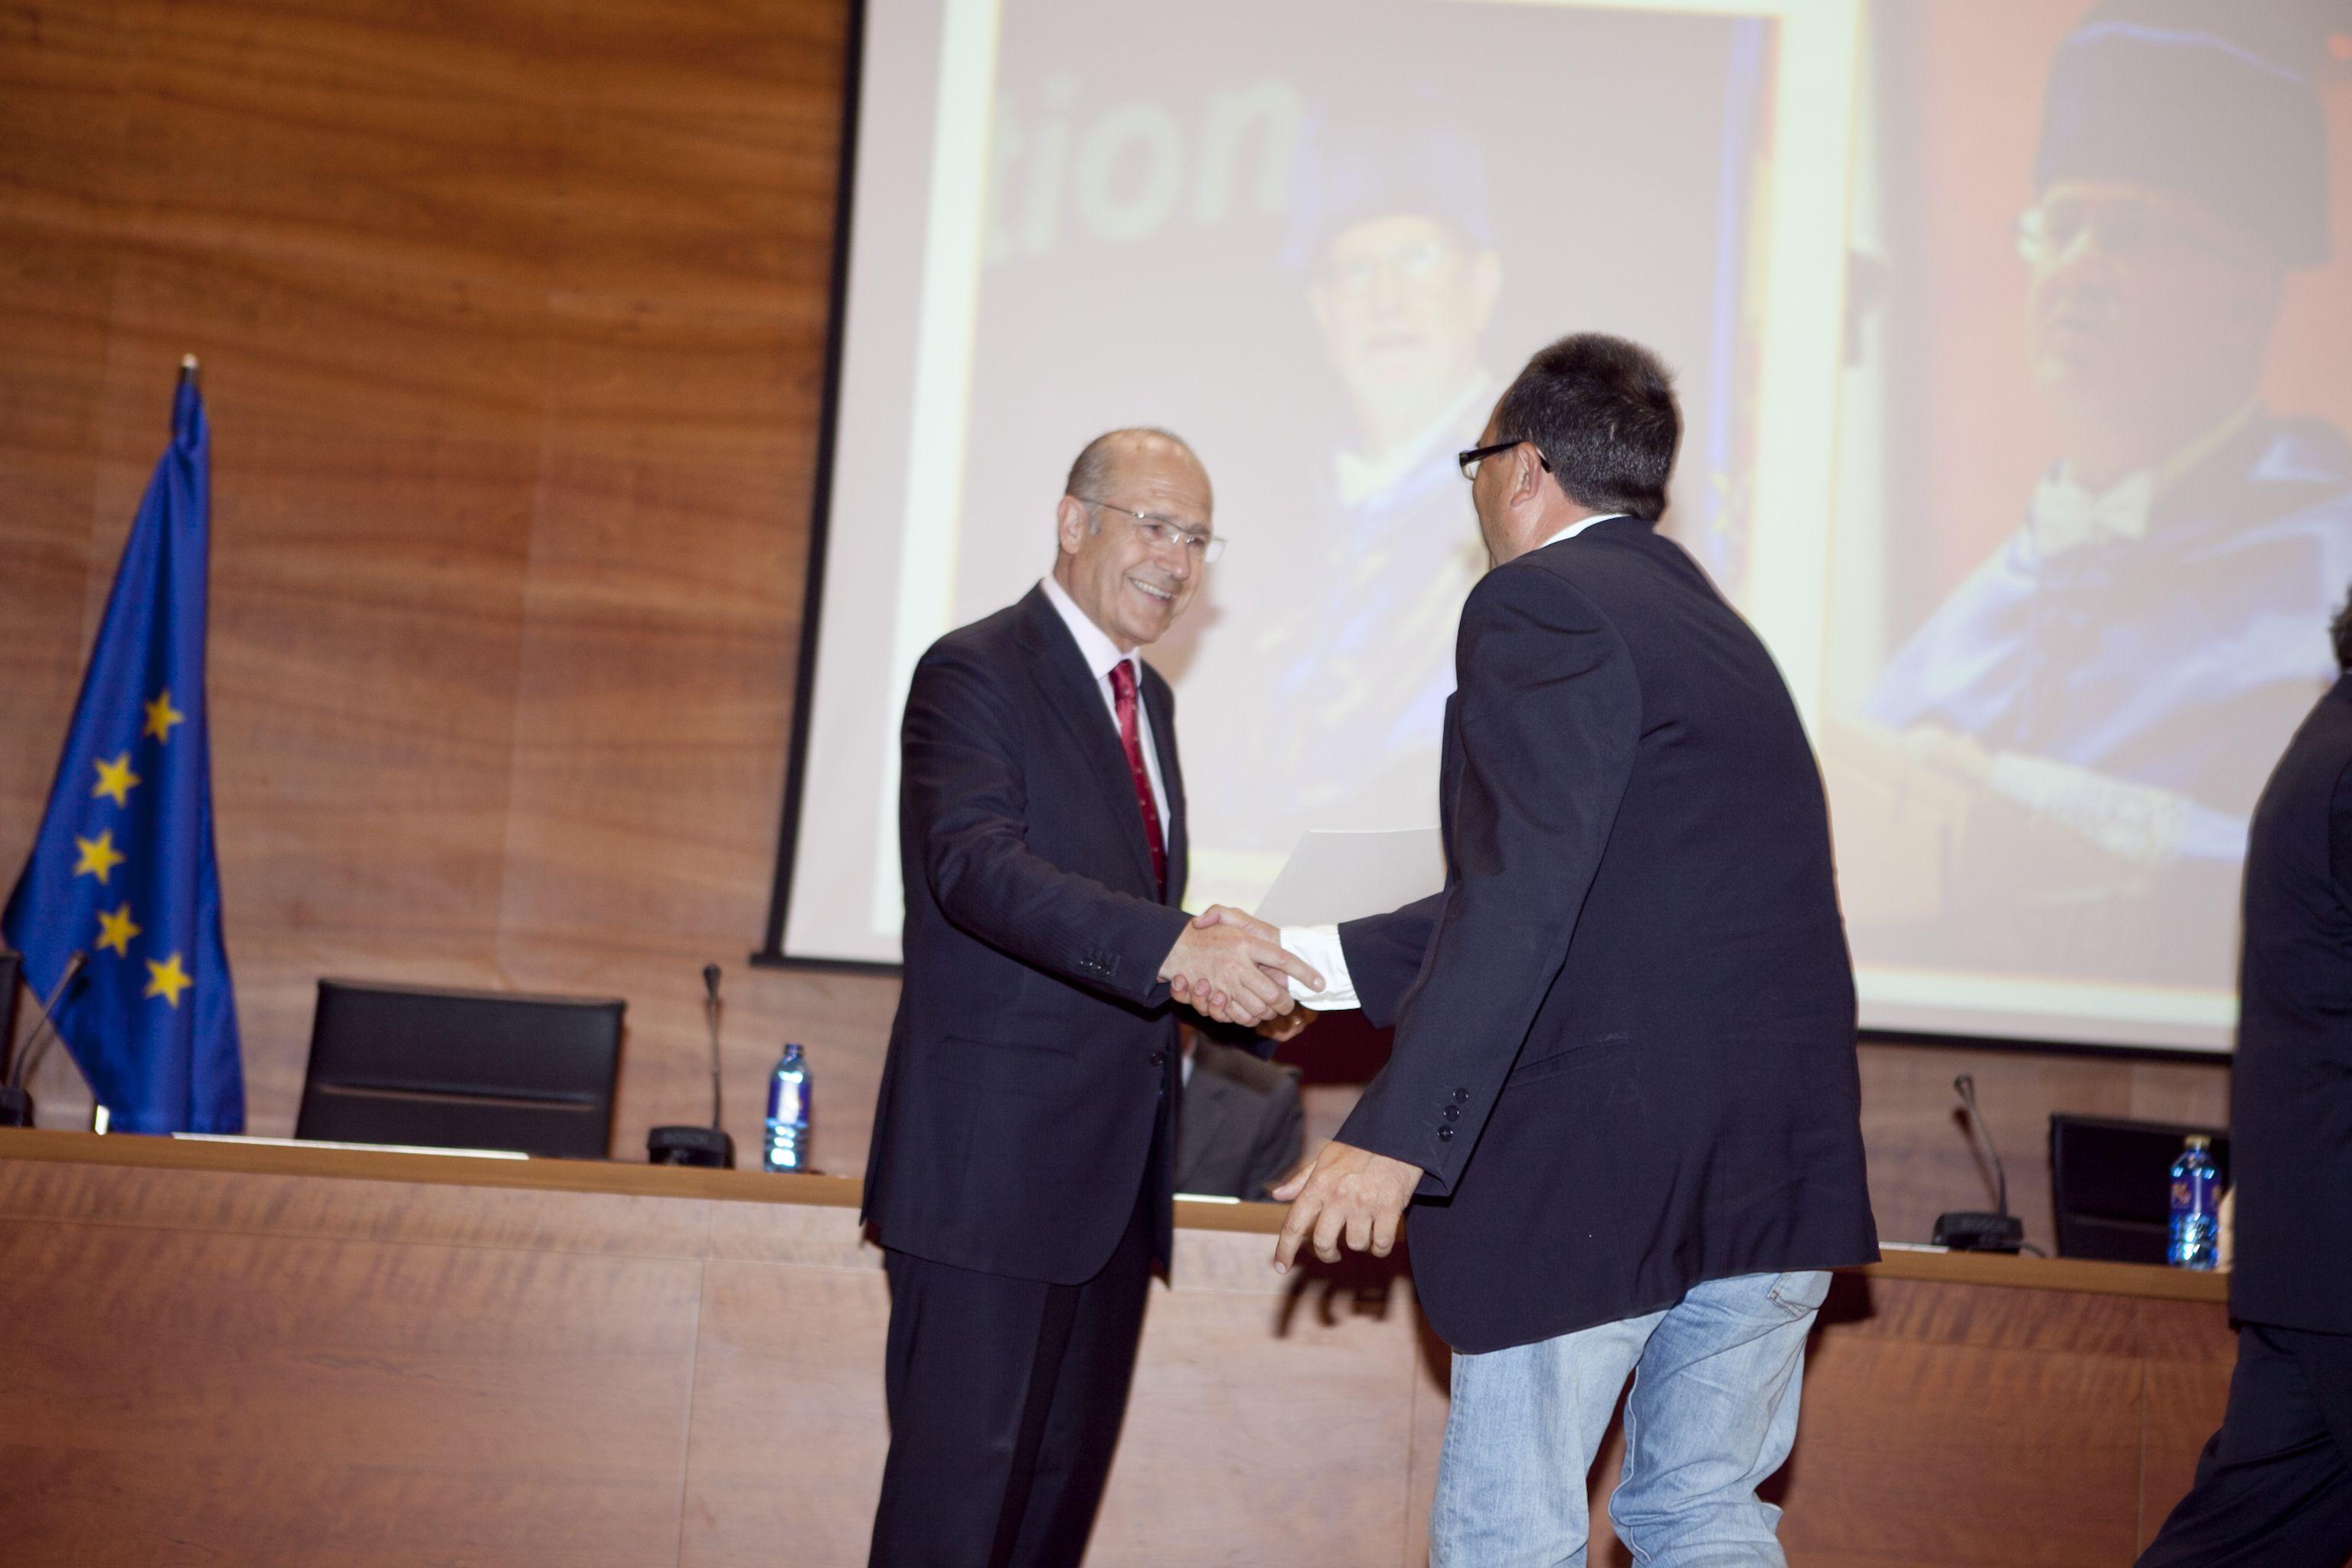 umh-diplomas-rector_mg_6490.jpg